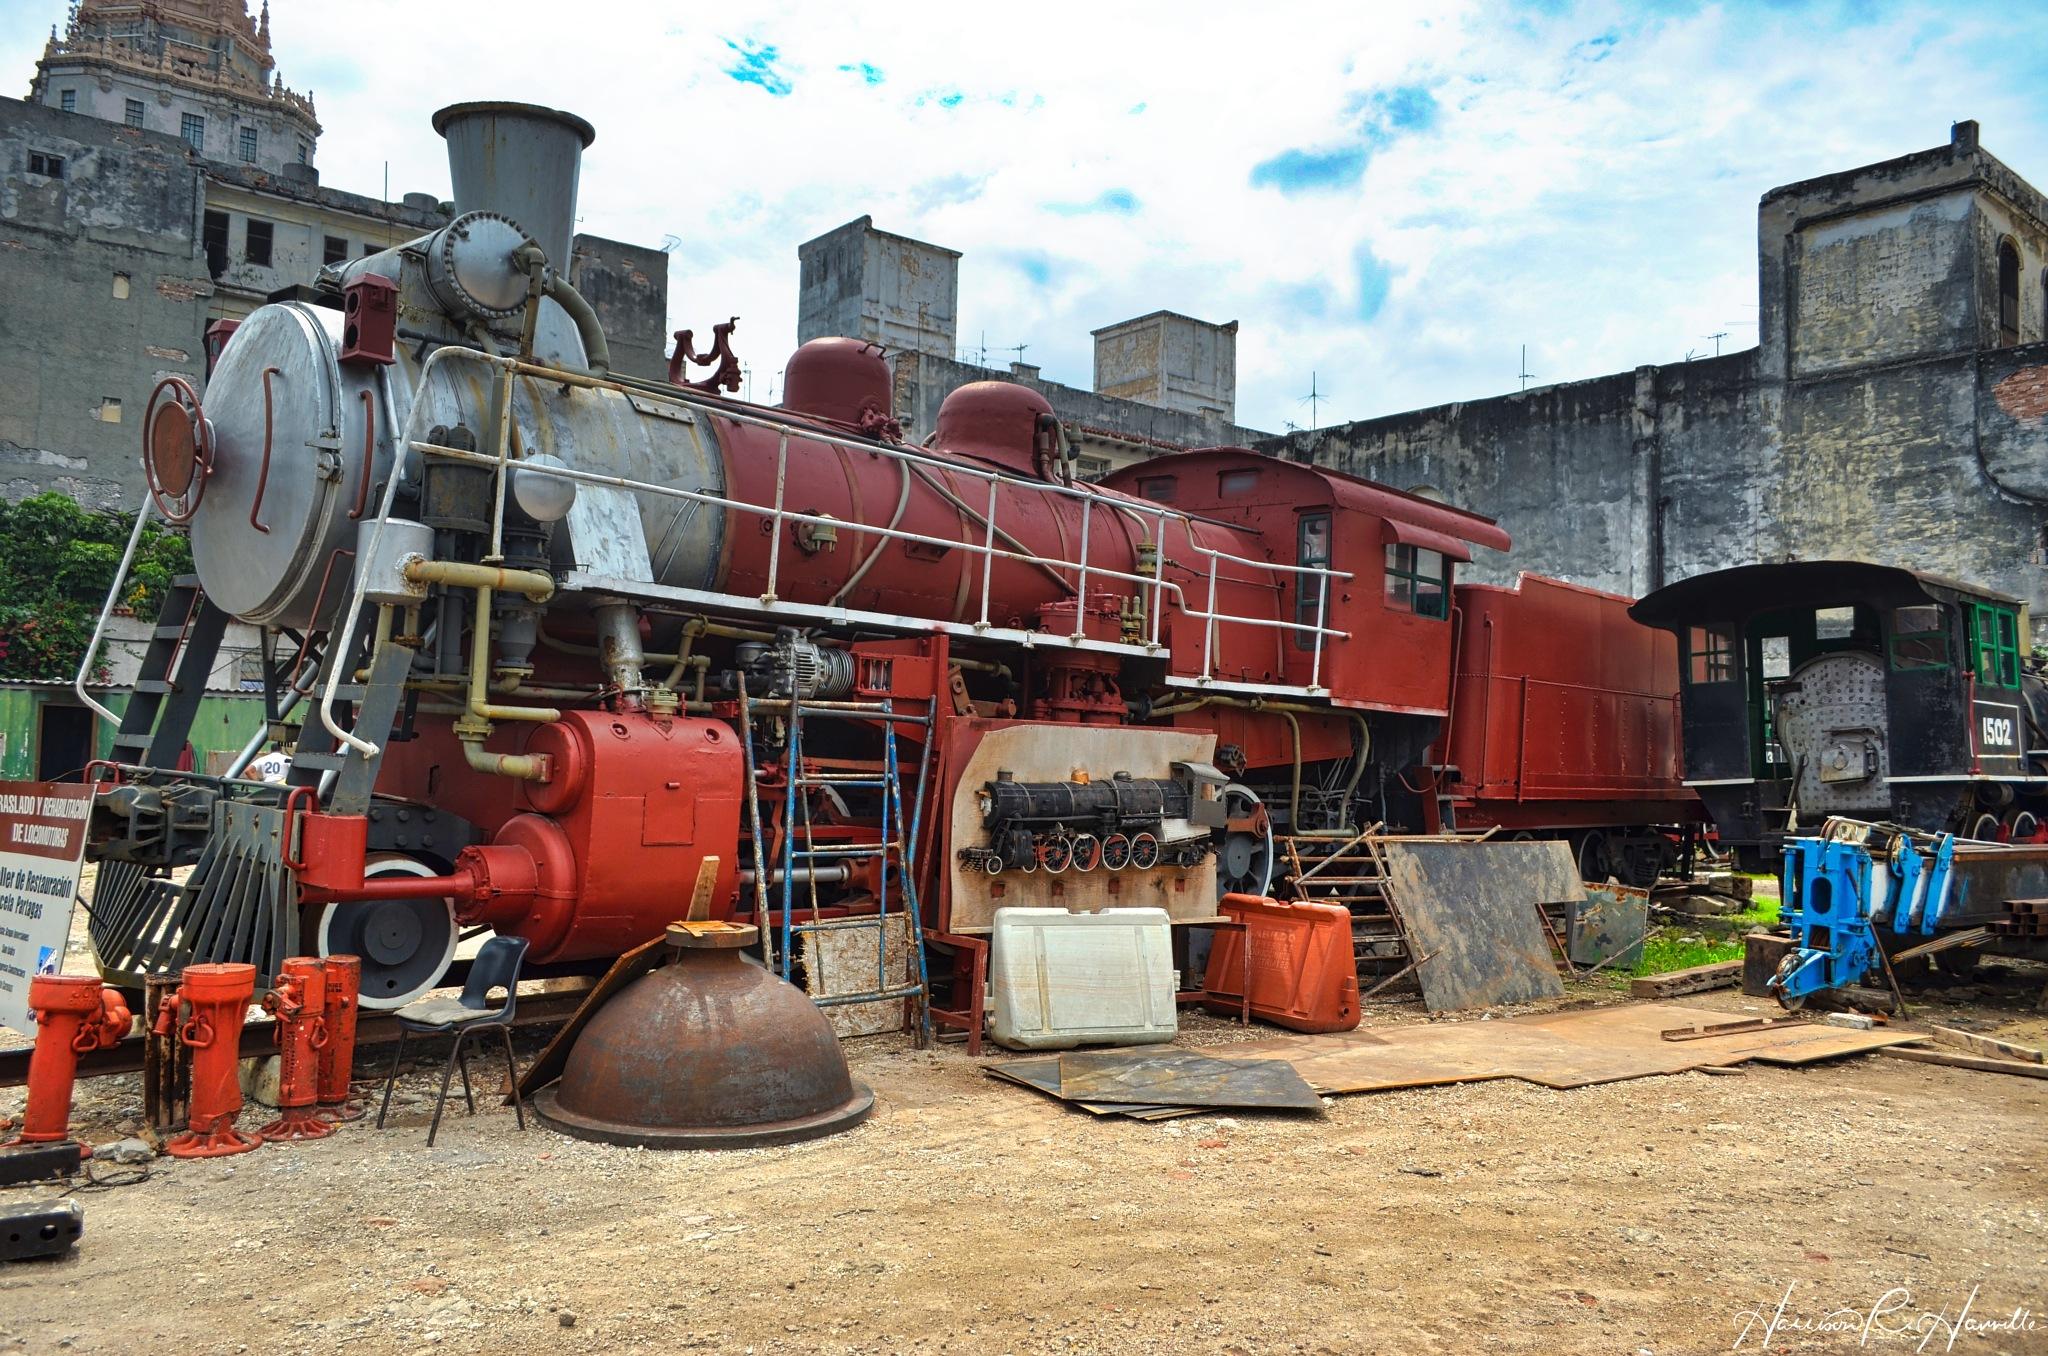 In The Restoration Yard by Harrison Hanville